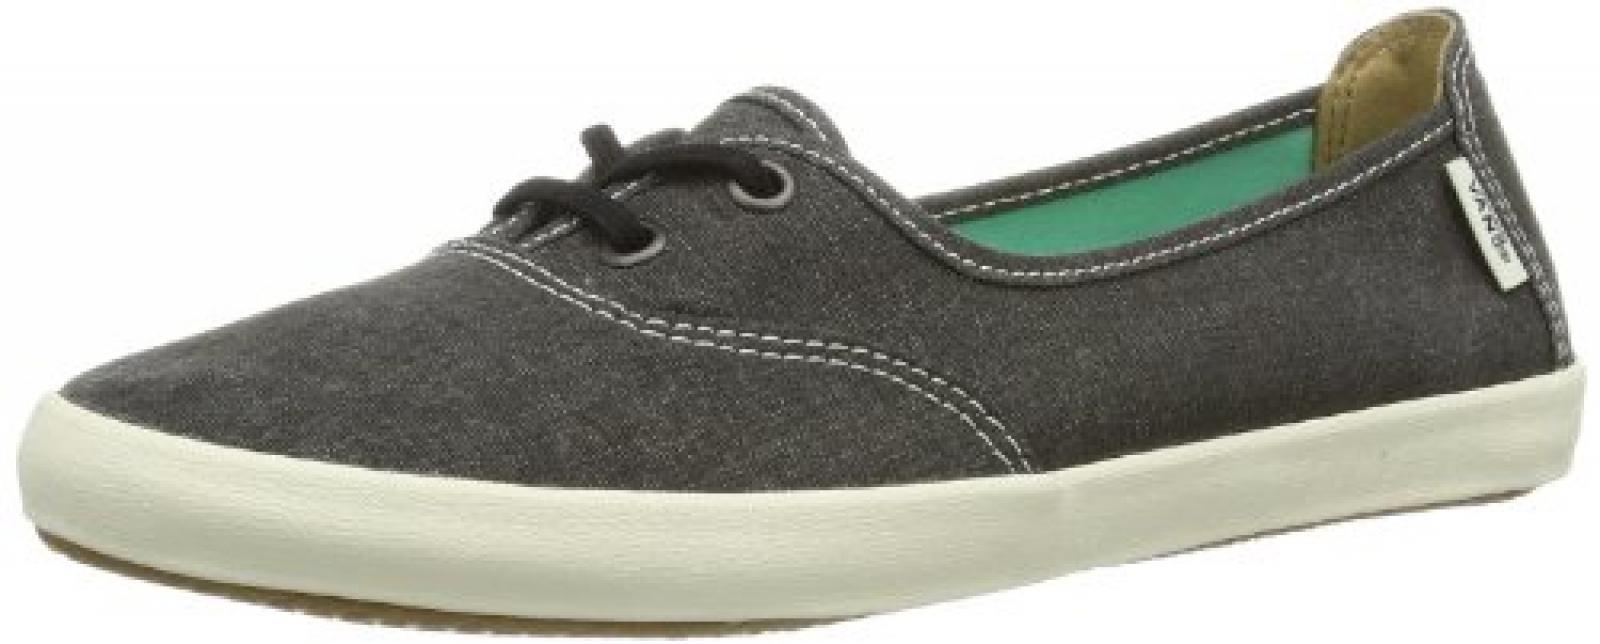 Vans W SOLANA BLACK/SPEARMINT VVOY0OQ Damen Sneaker